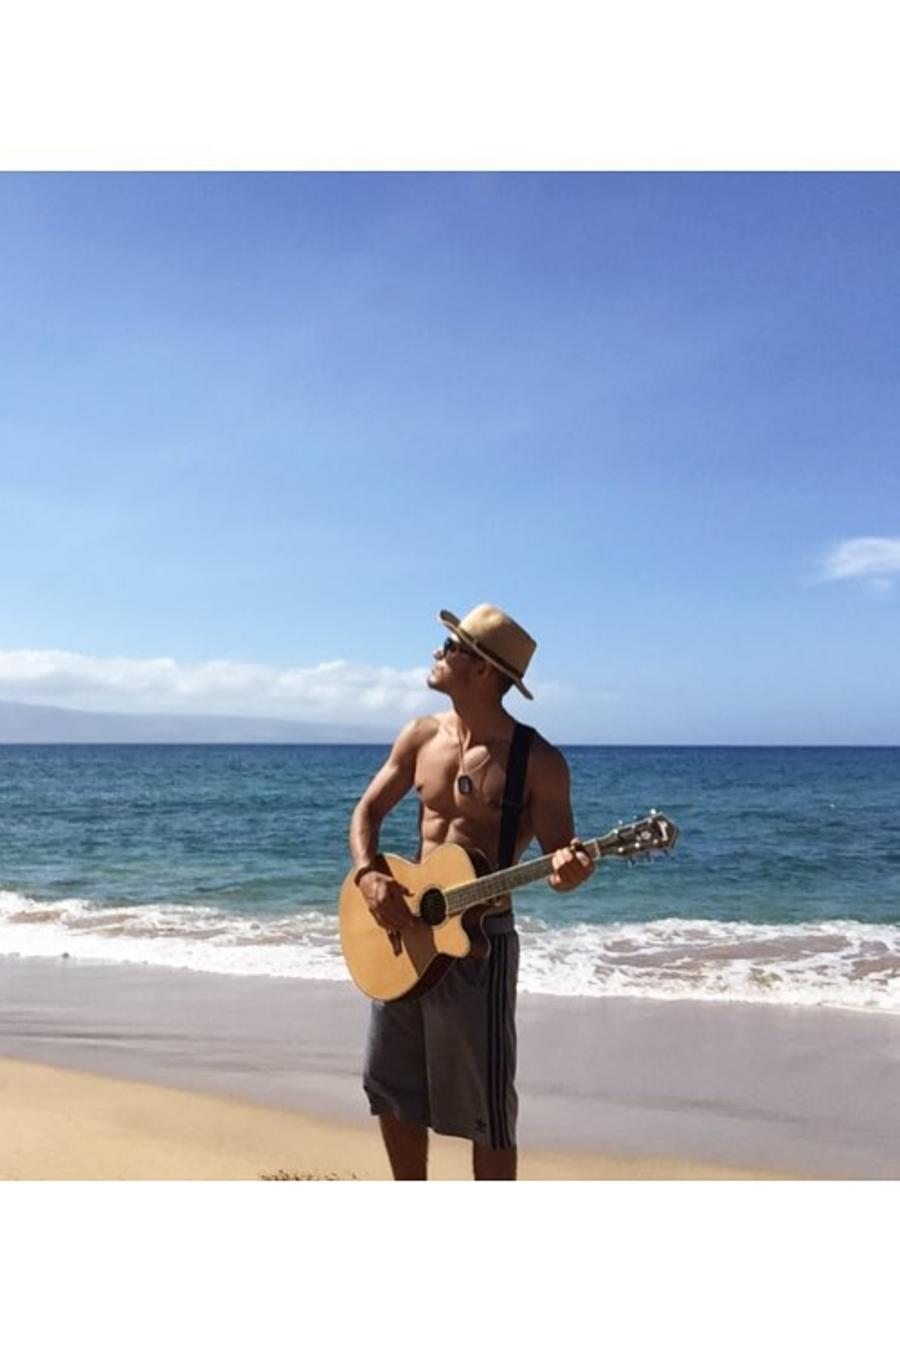 Michel Duval tocando guitara.